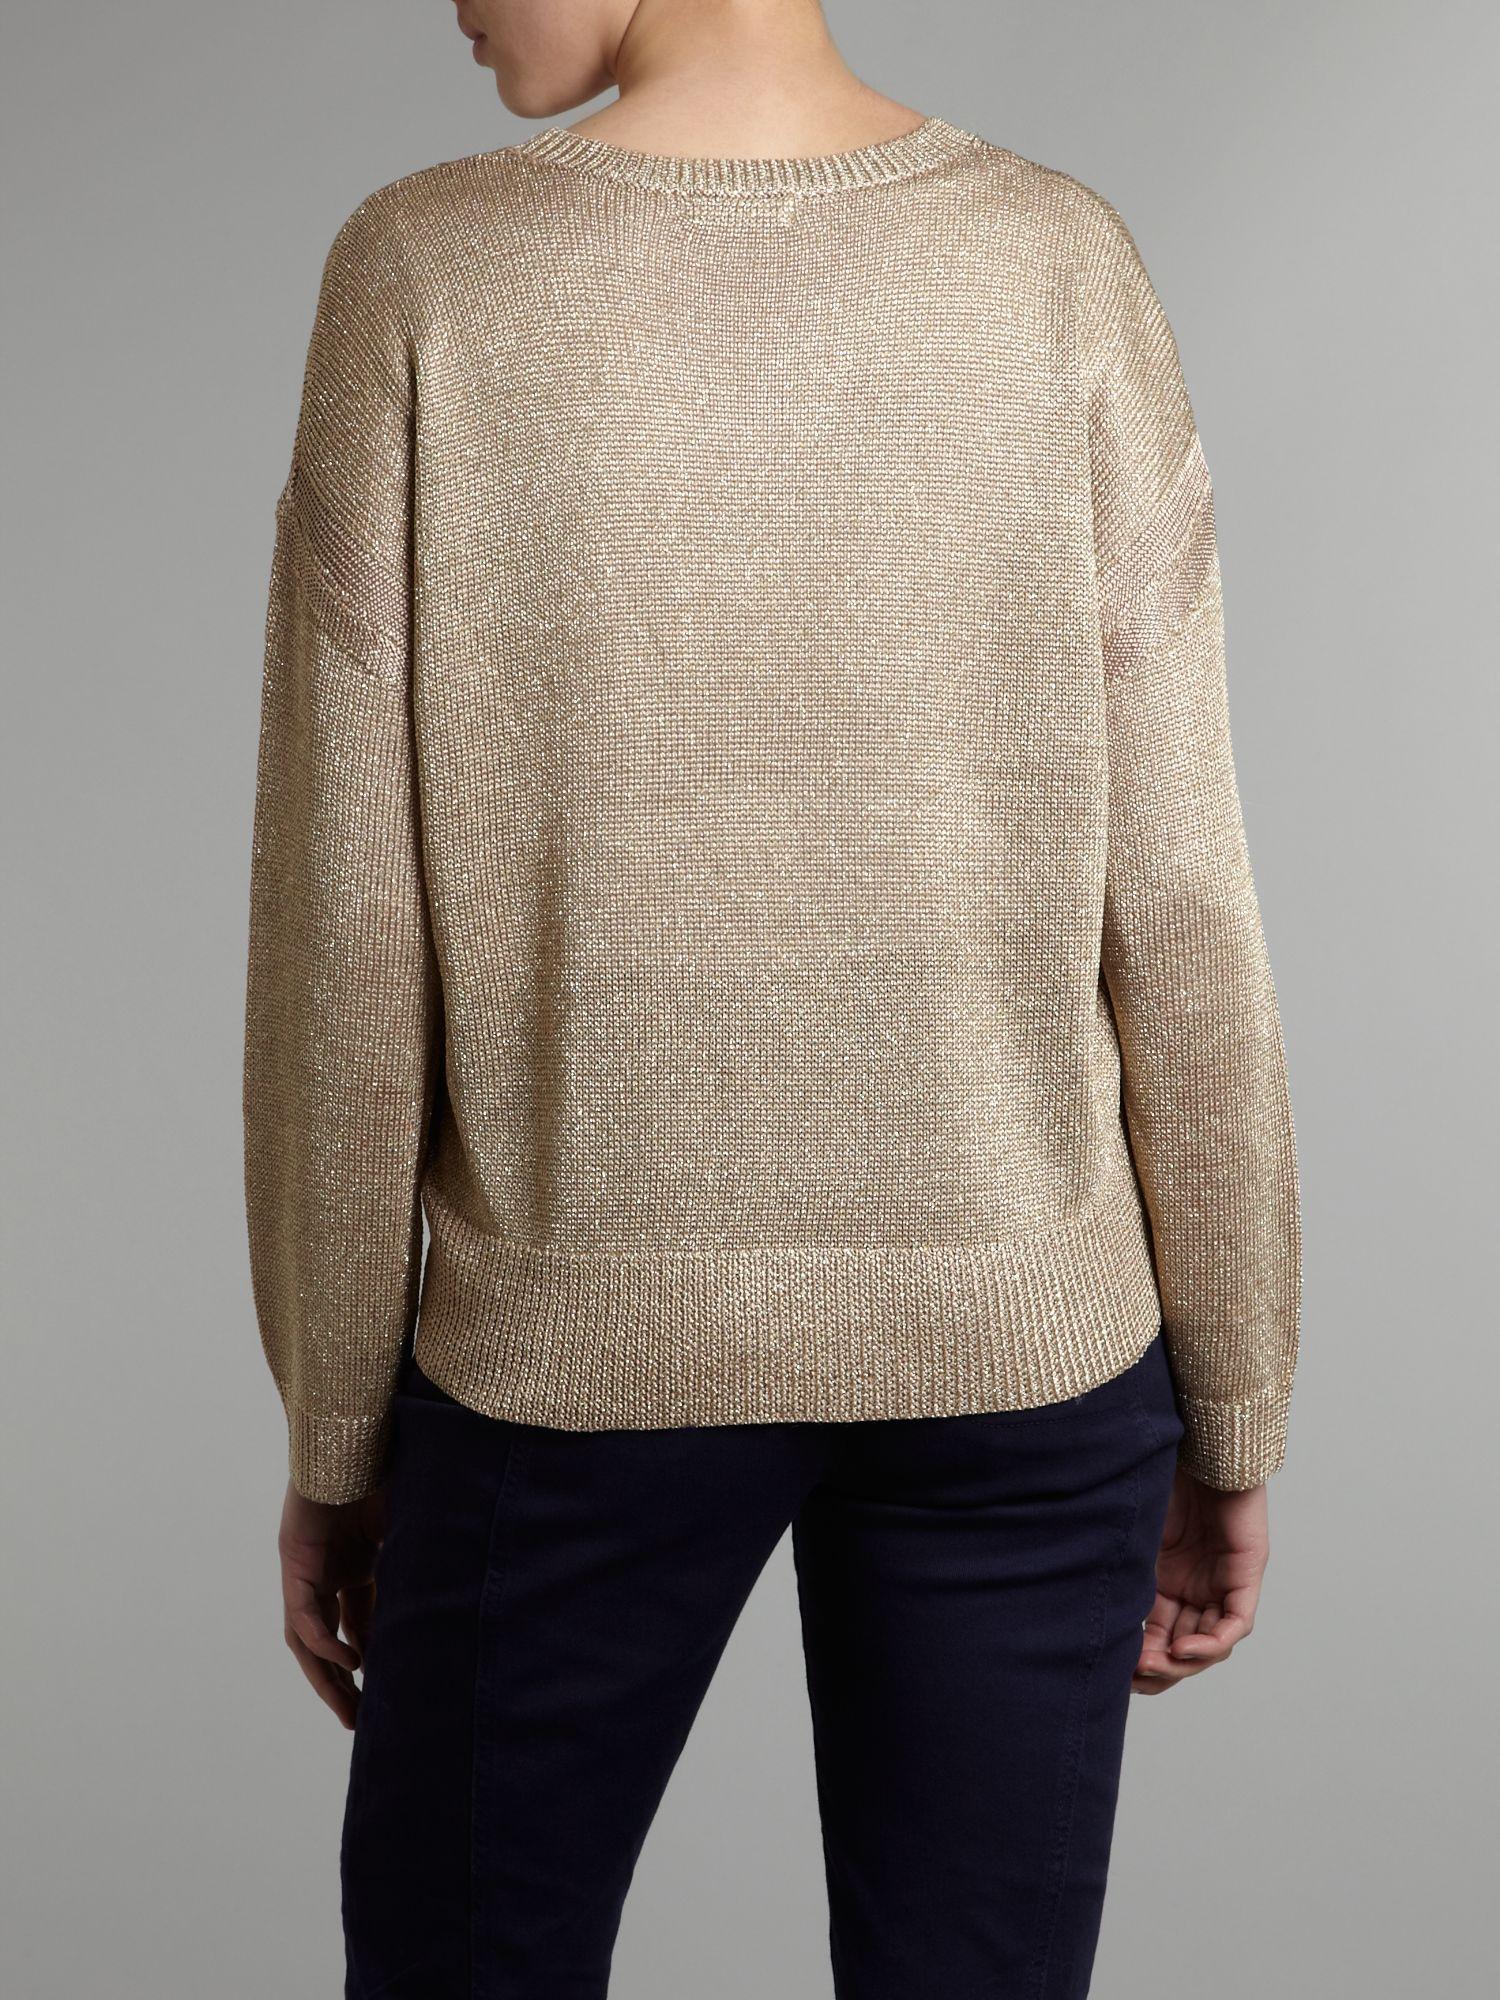 Sequin Sleeve Sweater